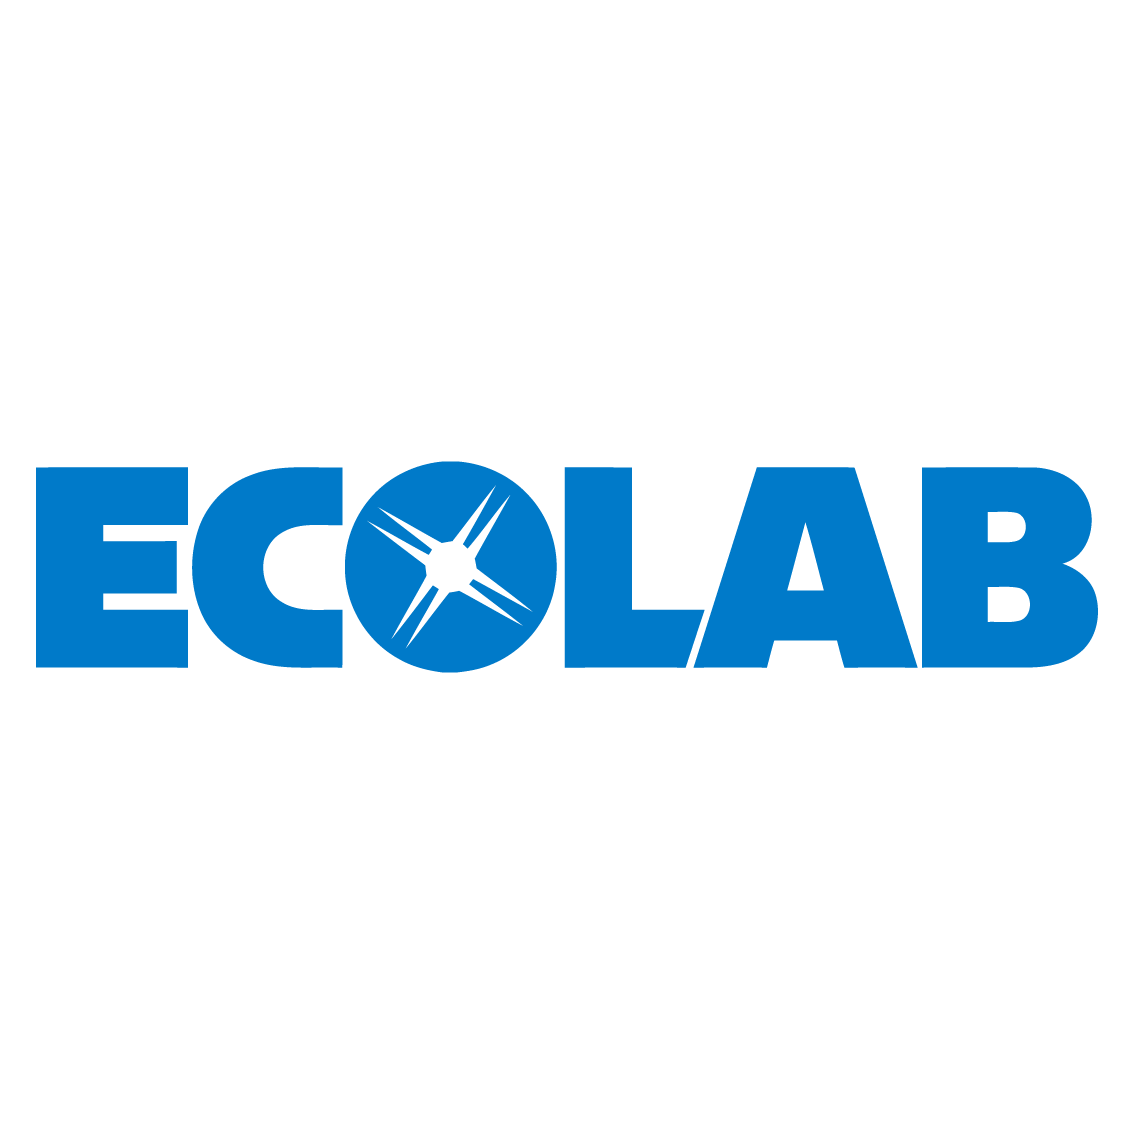 panta chimica catalogo ecolab